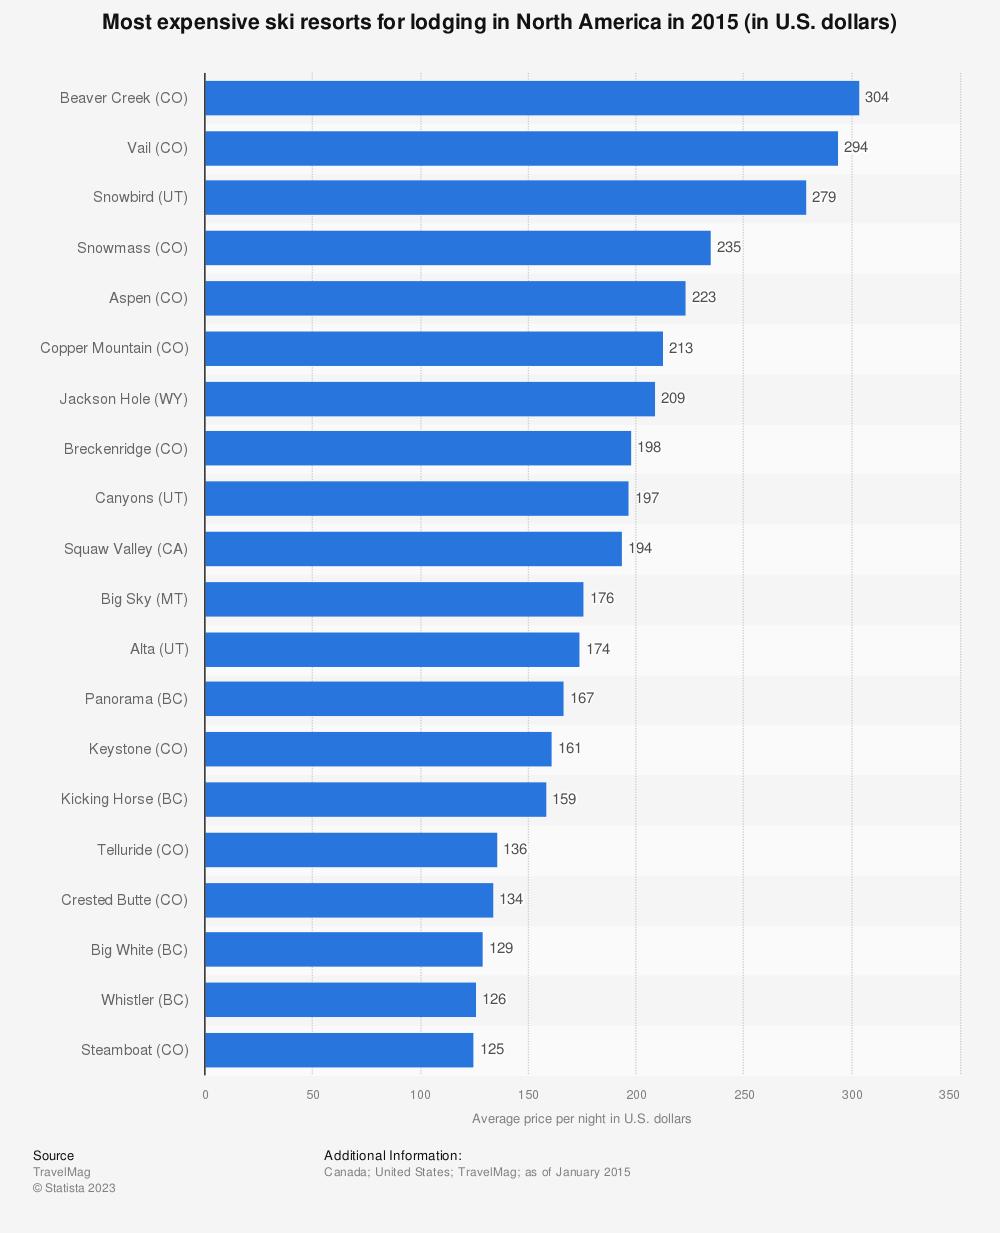 Statistic: Most expensive ski resorts for lodging in North America in 2015 (in U.S. dollars) | Statista